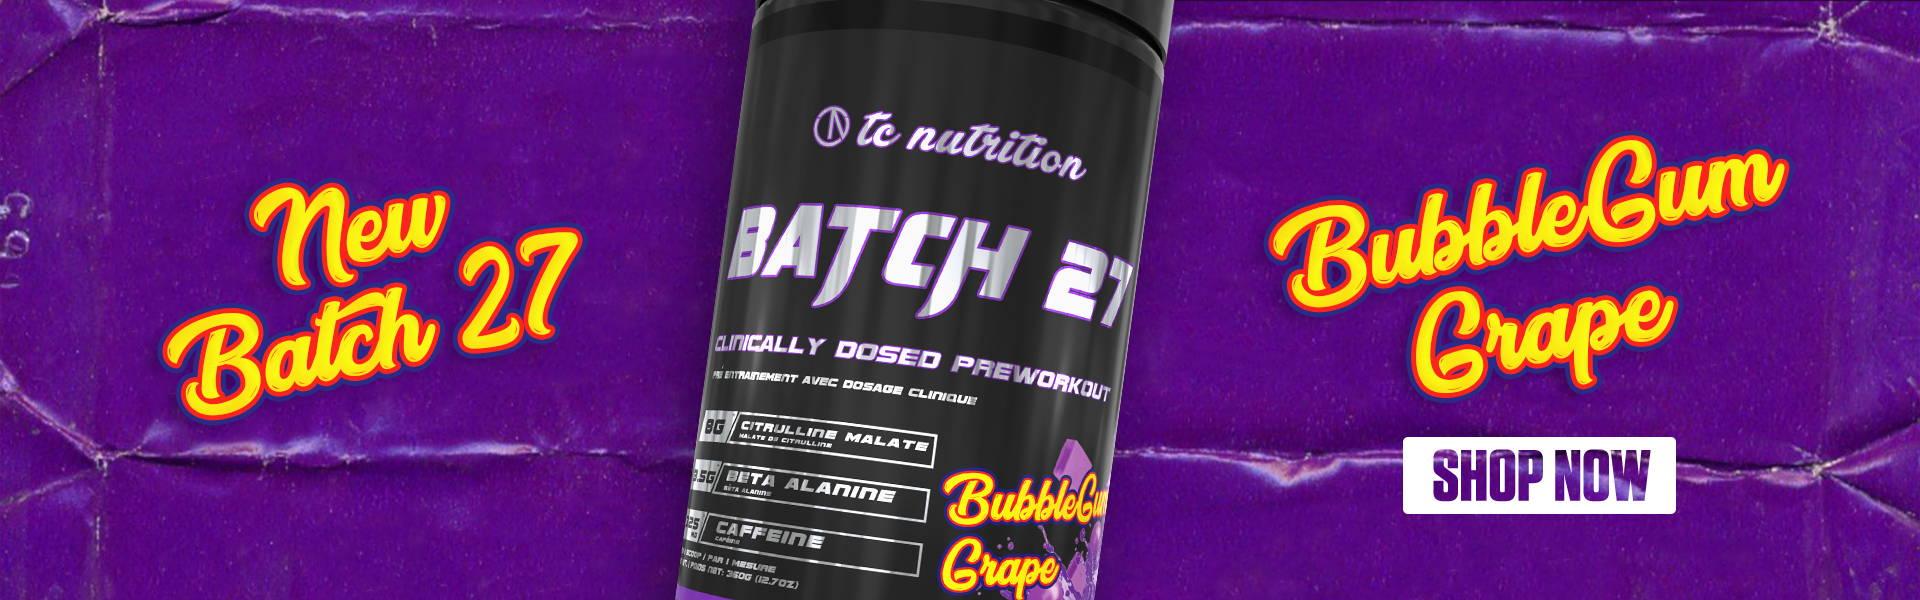 new batch 27 bubblegum grape